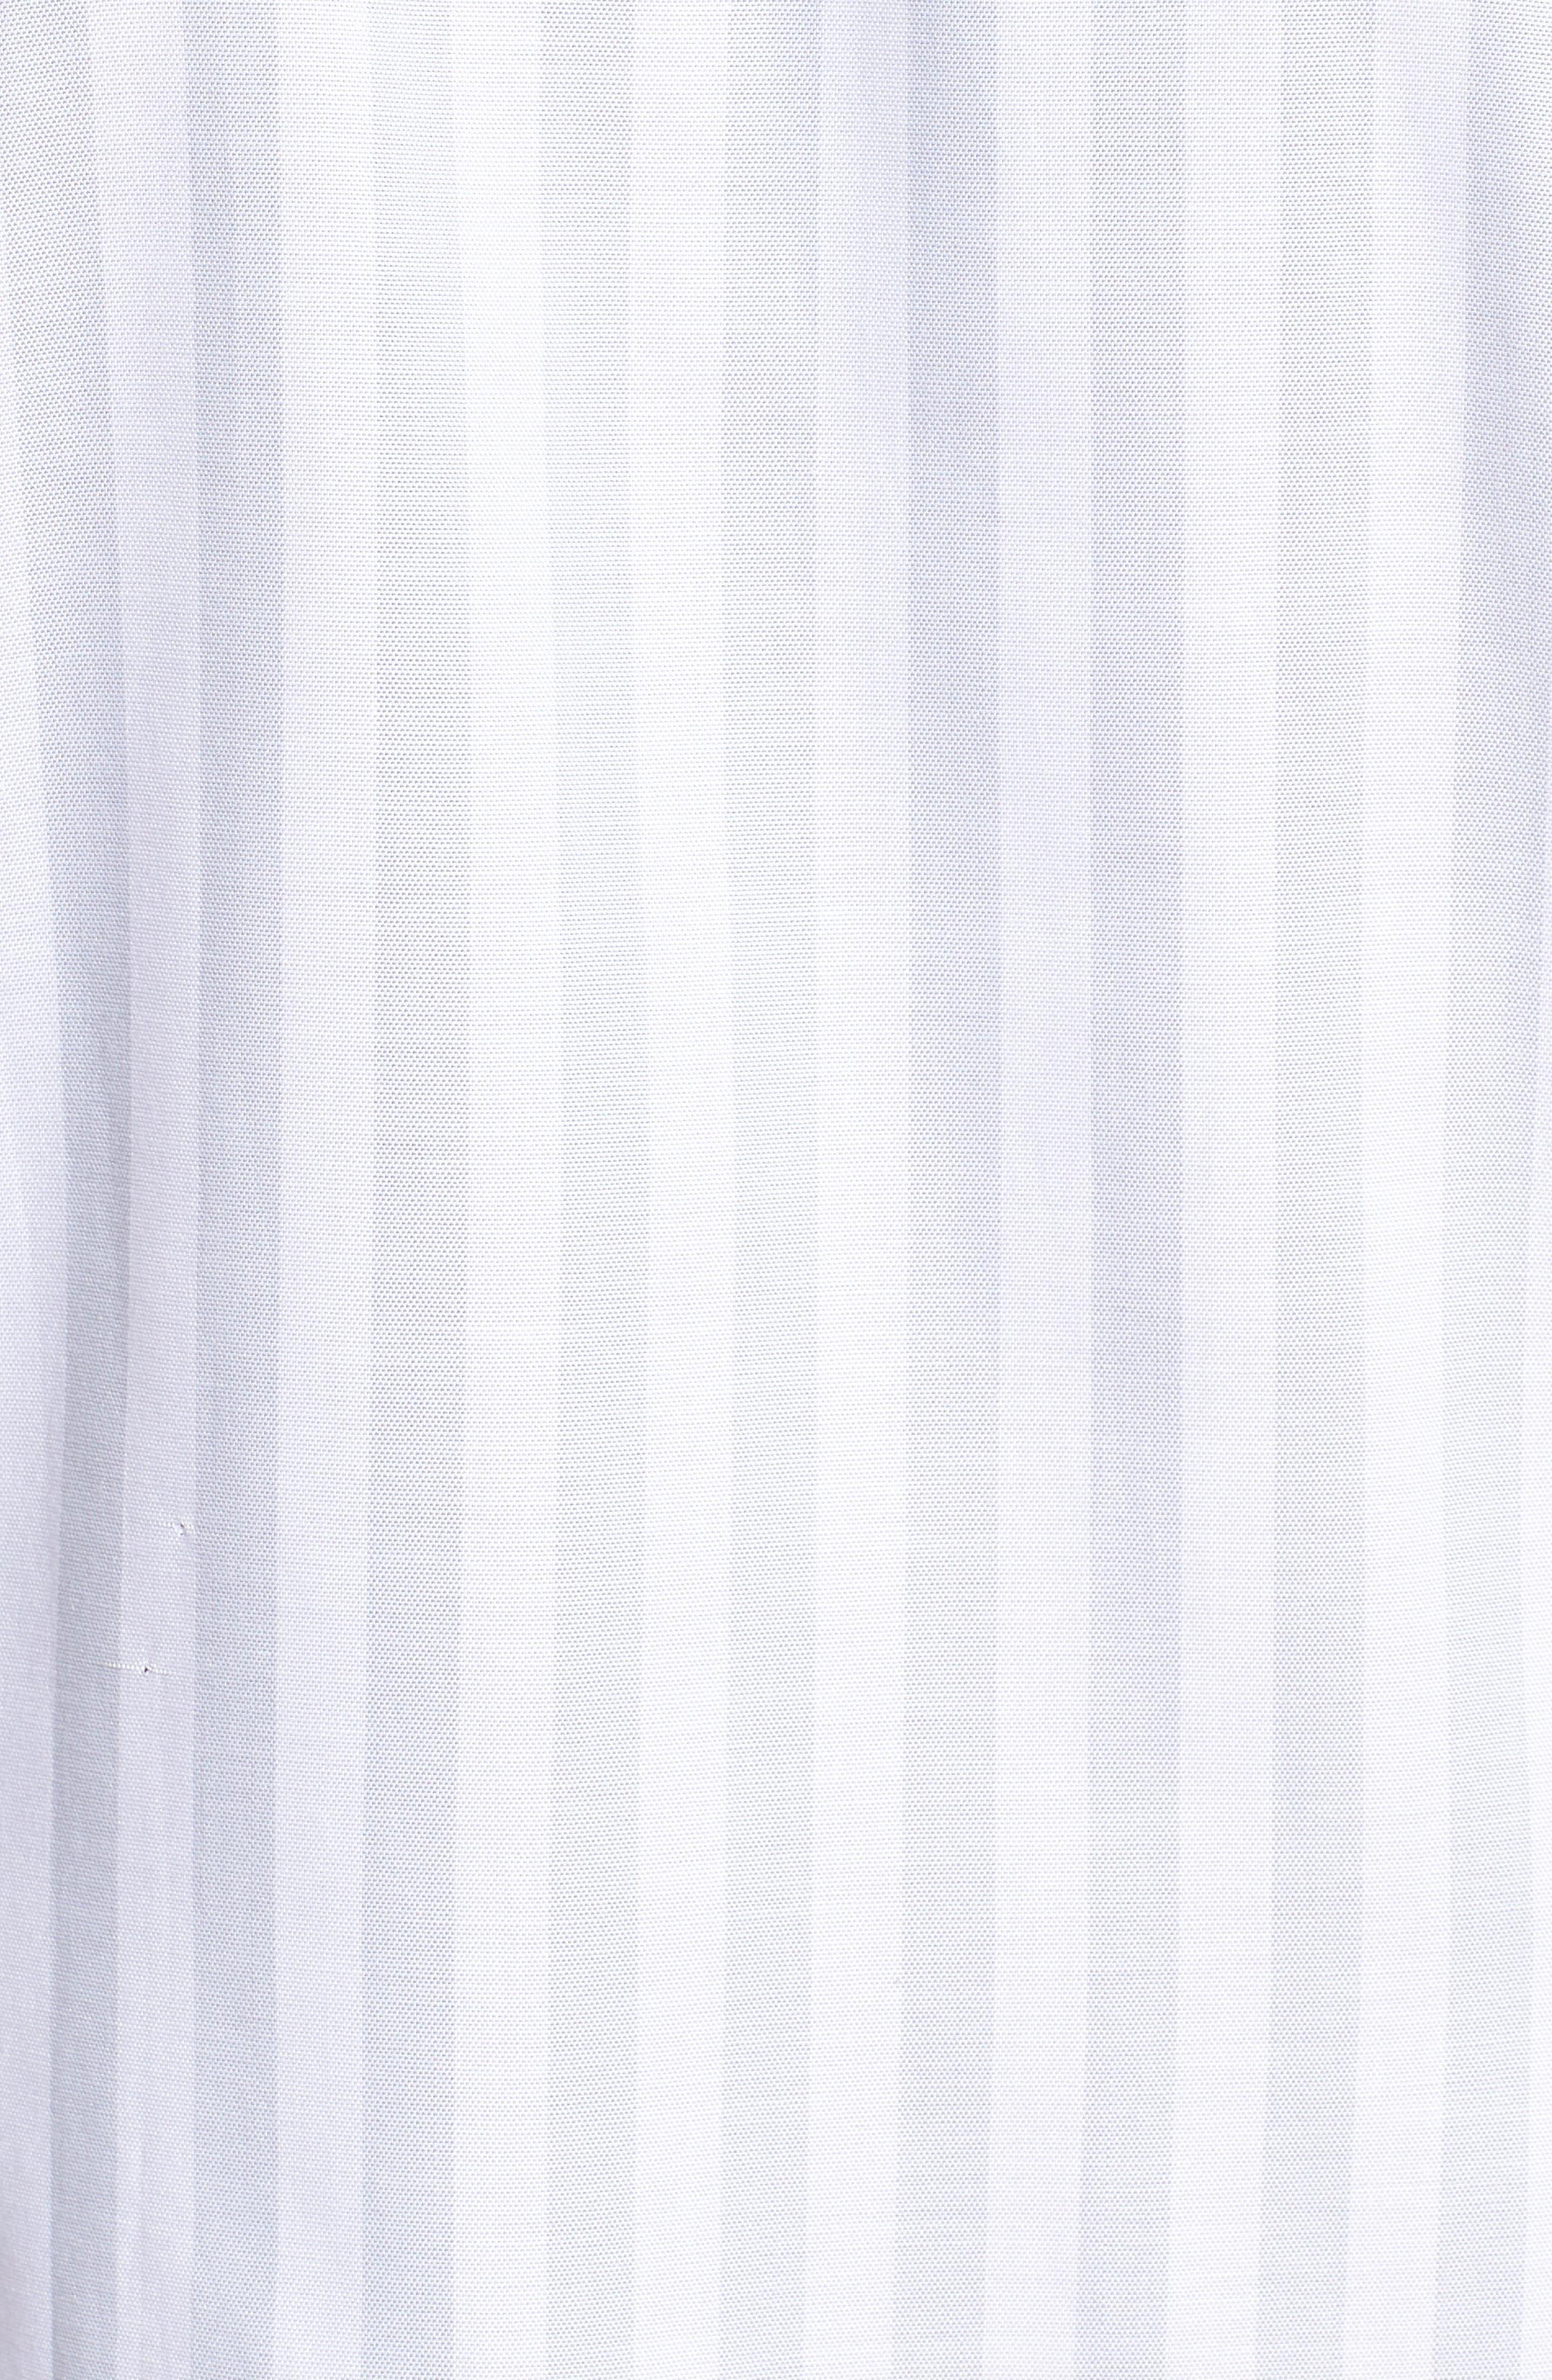 TED BAKER LONDON,                             Vertical Stripe Trim Fit Short Sleeve Sport Shirt,                             Alternate thumbnail 5, color,                             311